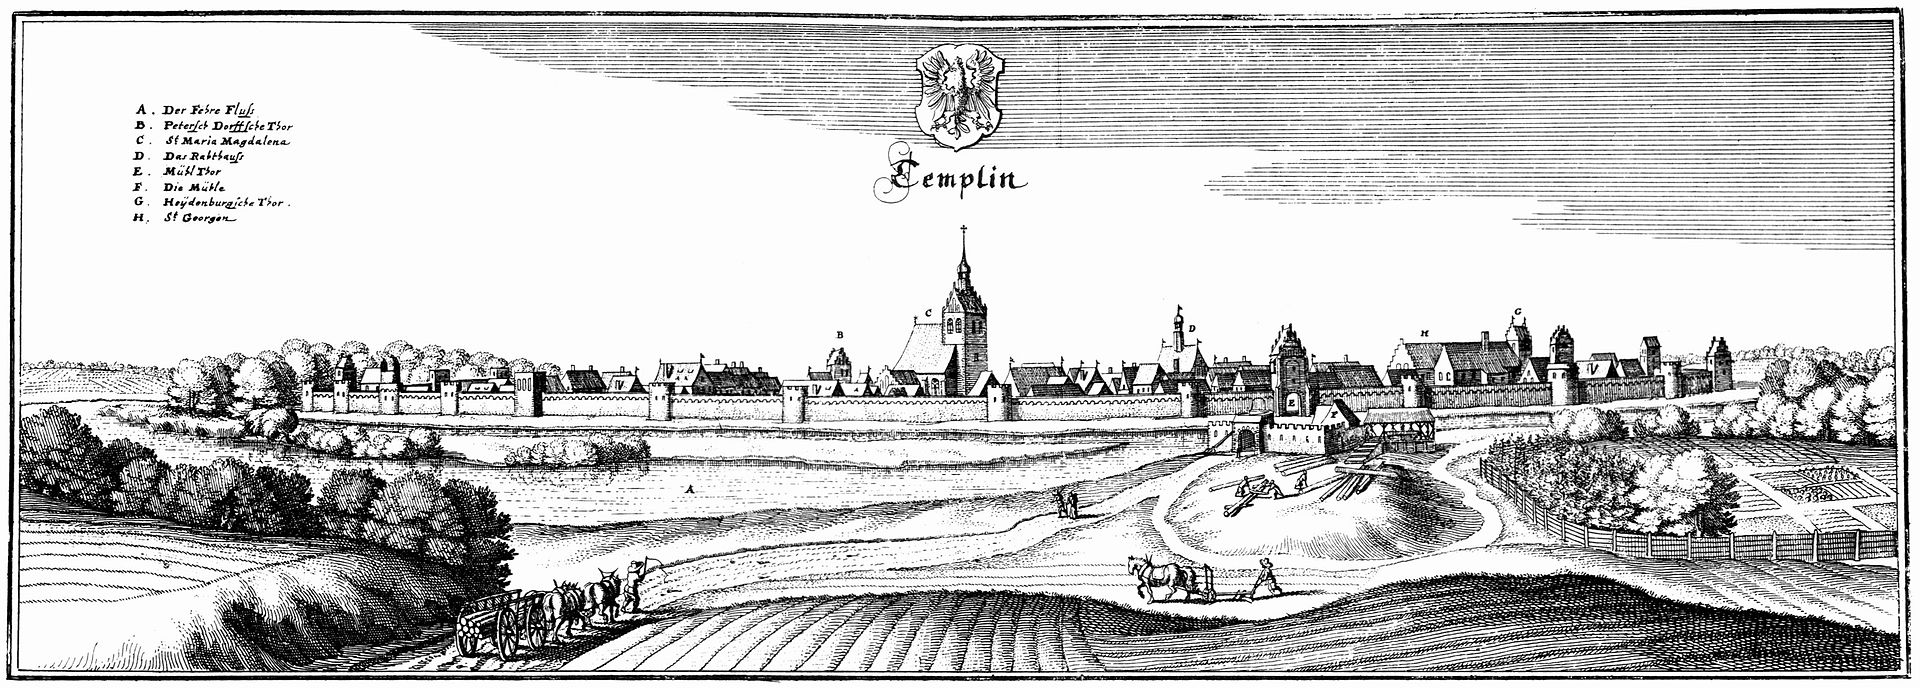 Templin-1652-Merian.jpg